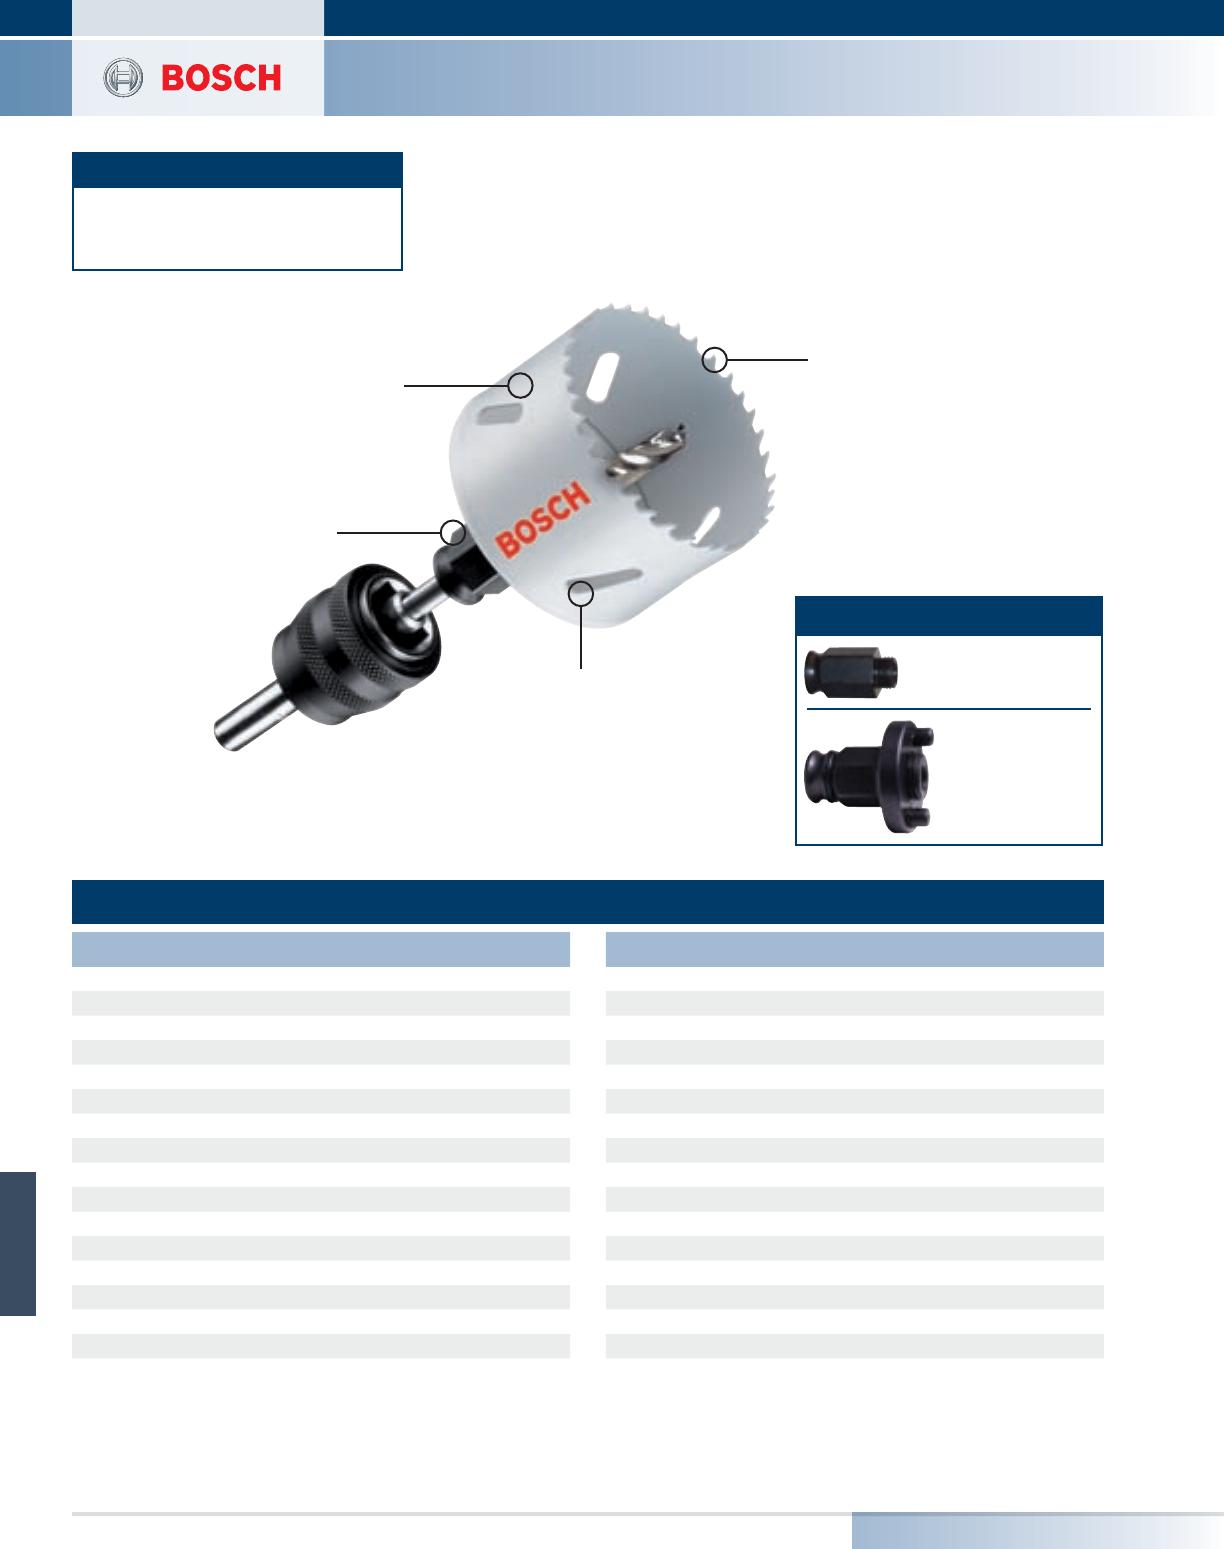 Bosch 37893 2-Inch Length 7//16-Inch Power Bit Magnetic Hex Nutsetter